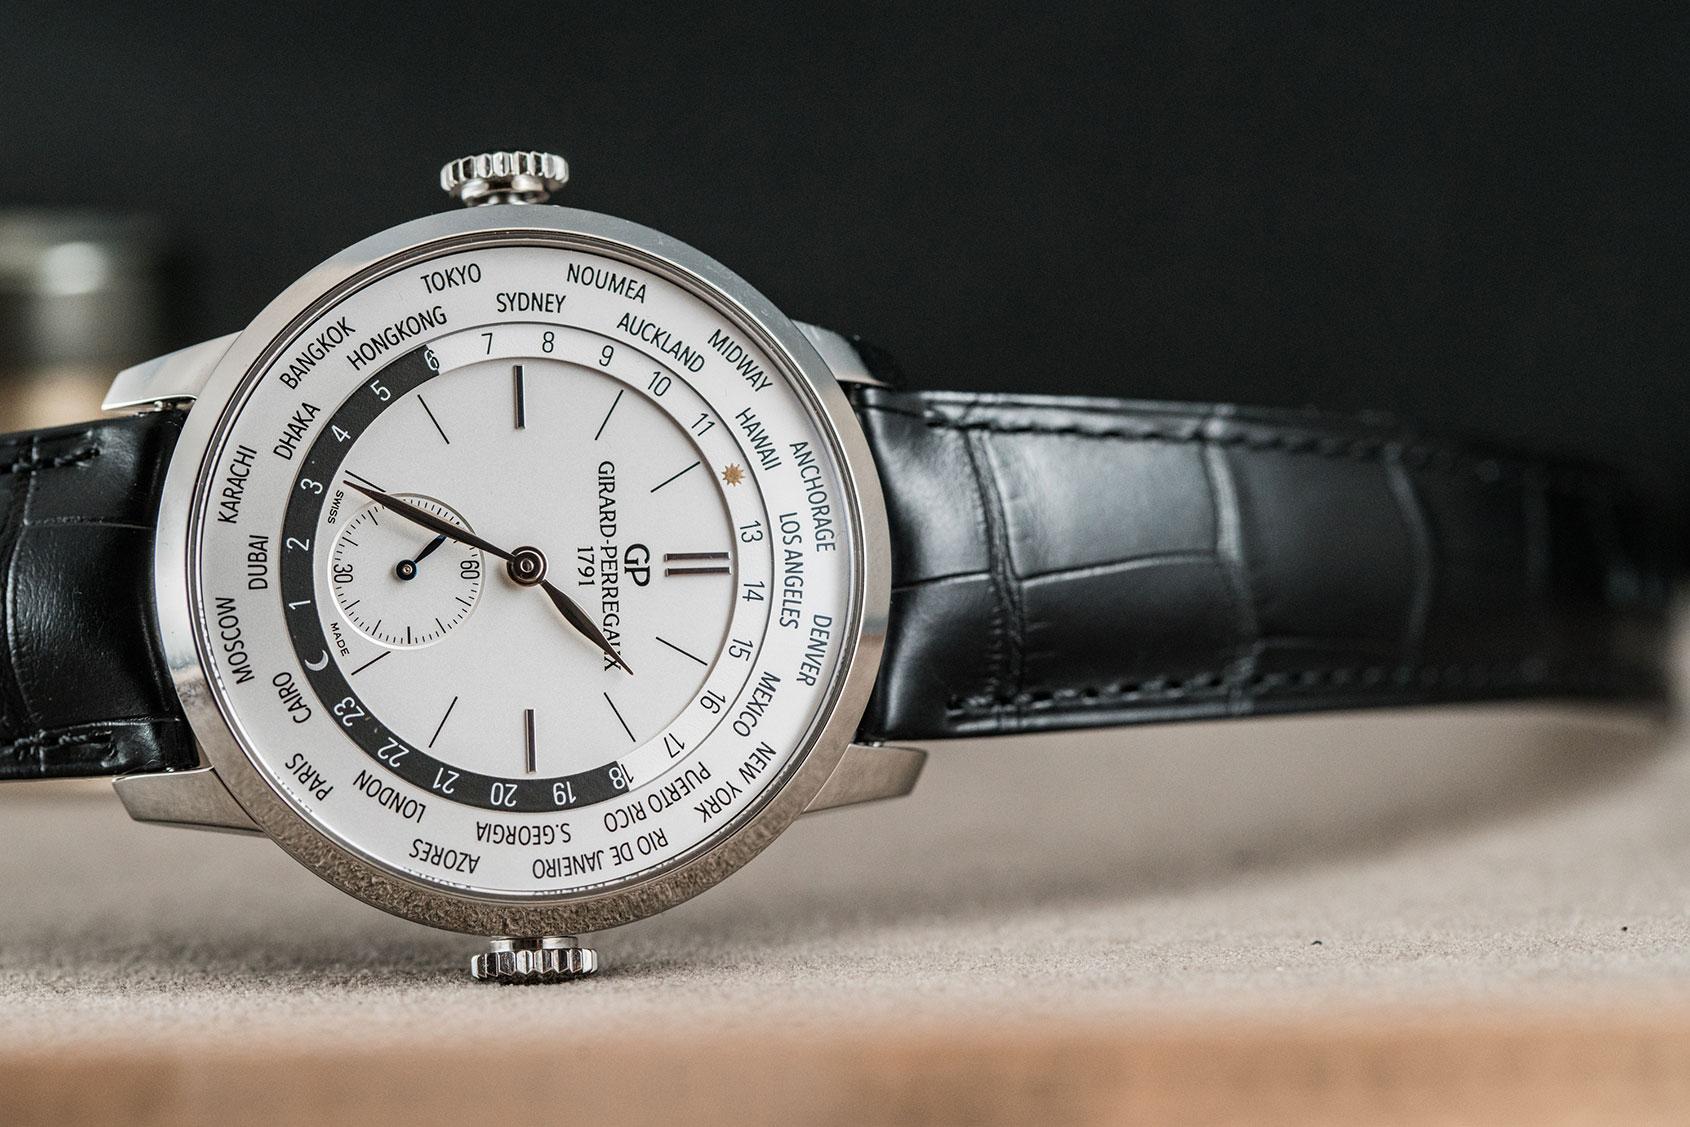 Have watch will travel, the Girard-Perregaux 1966 WW.TC in steel